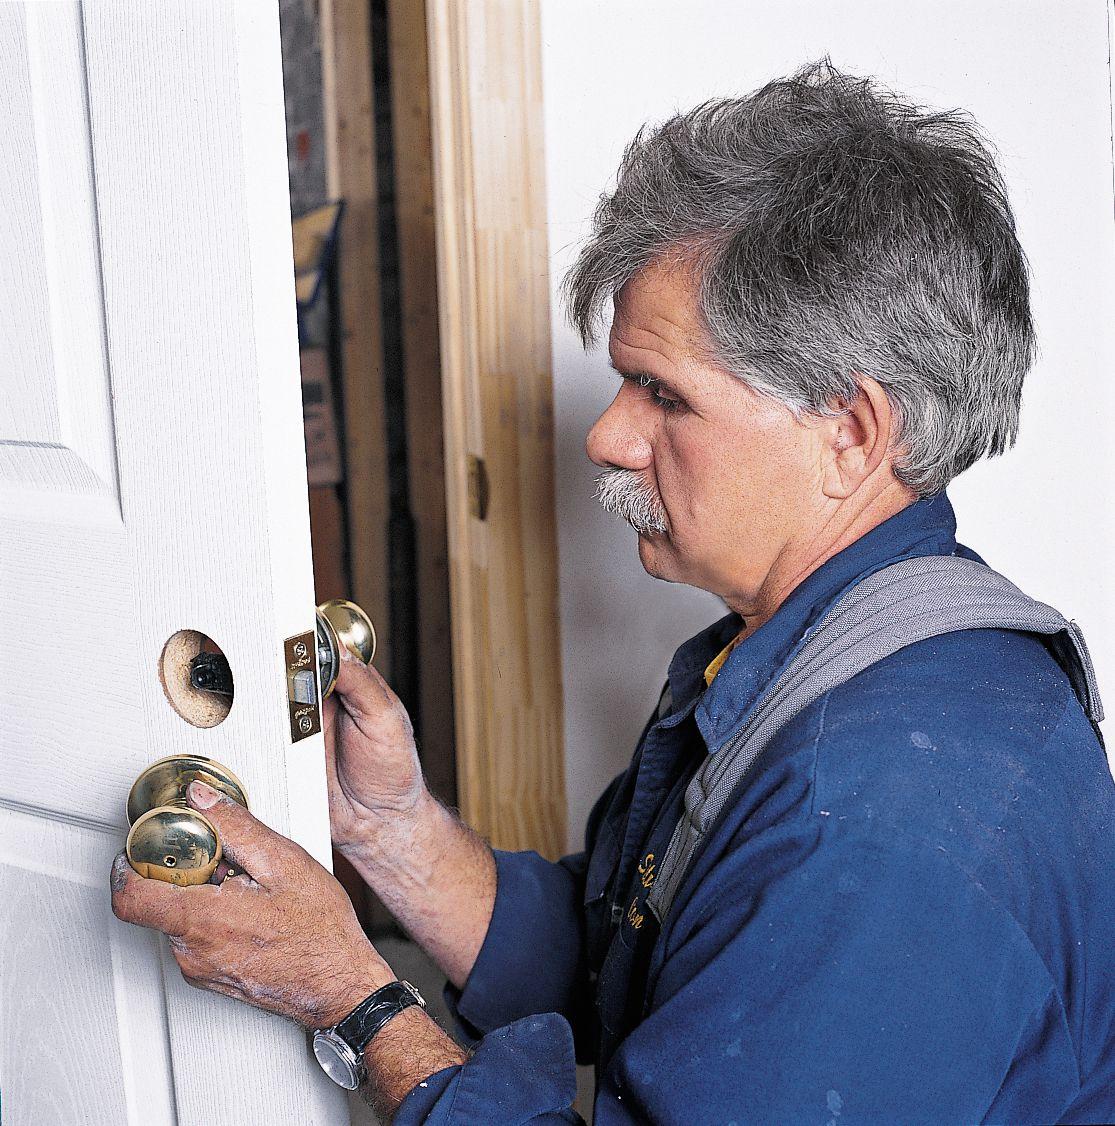 Man Installs Latch Hardware On Prehung Interior Door